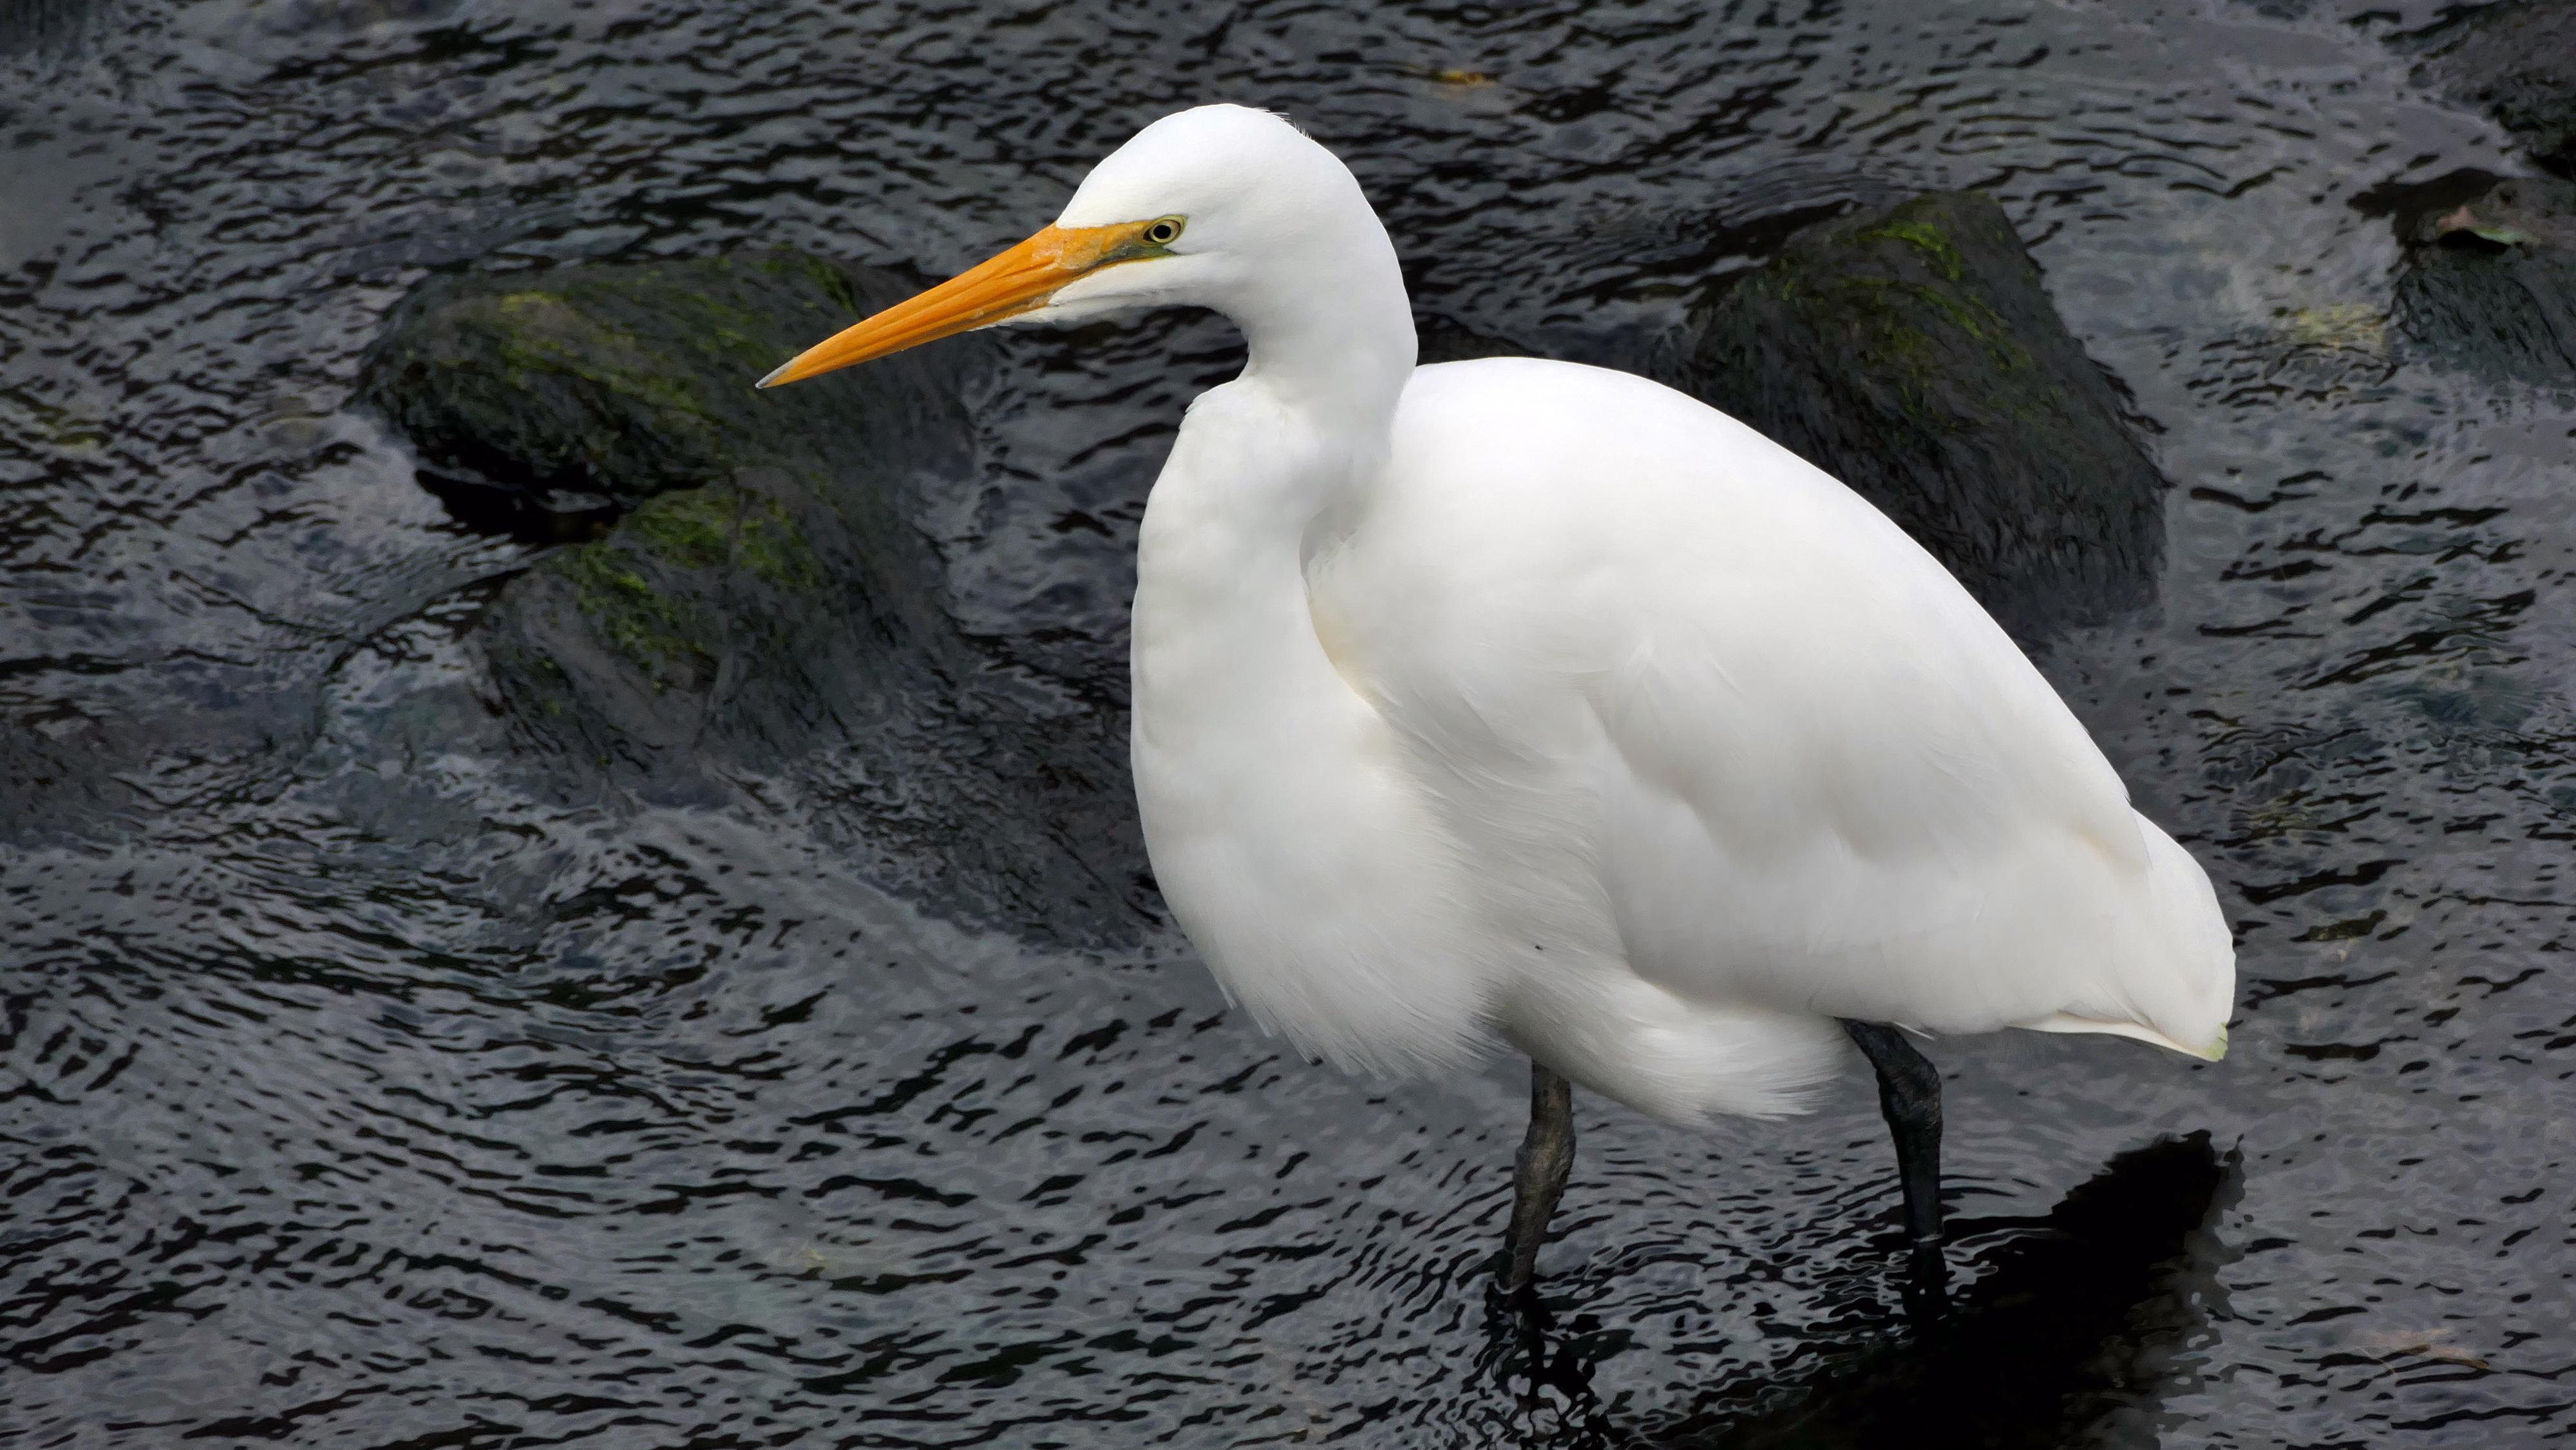 Kotuku, White heron, Egretta alba modesta,, Lumix FZ1000, Nature Lover, Outdoor, Free photos, HQ Photo